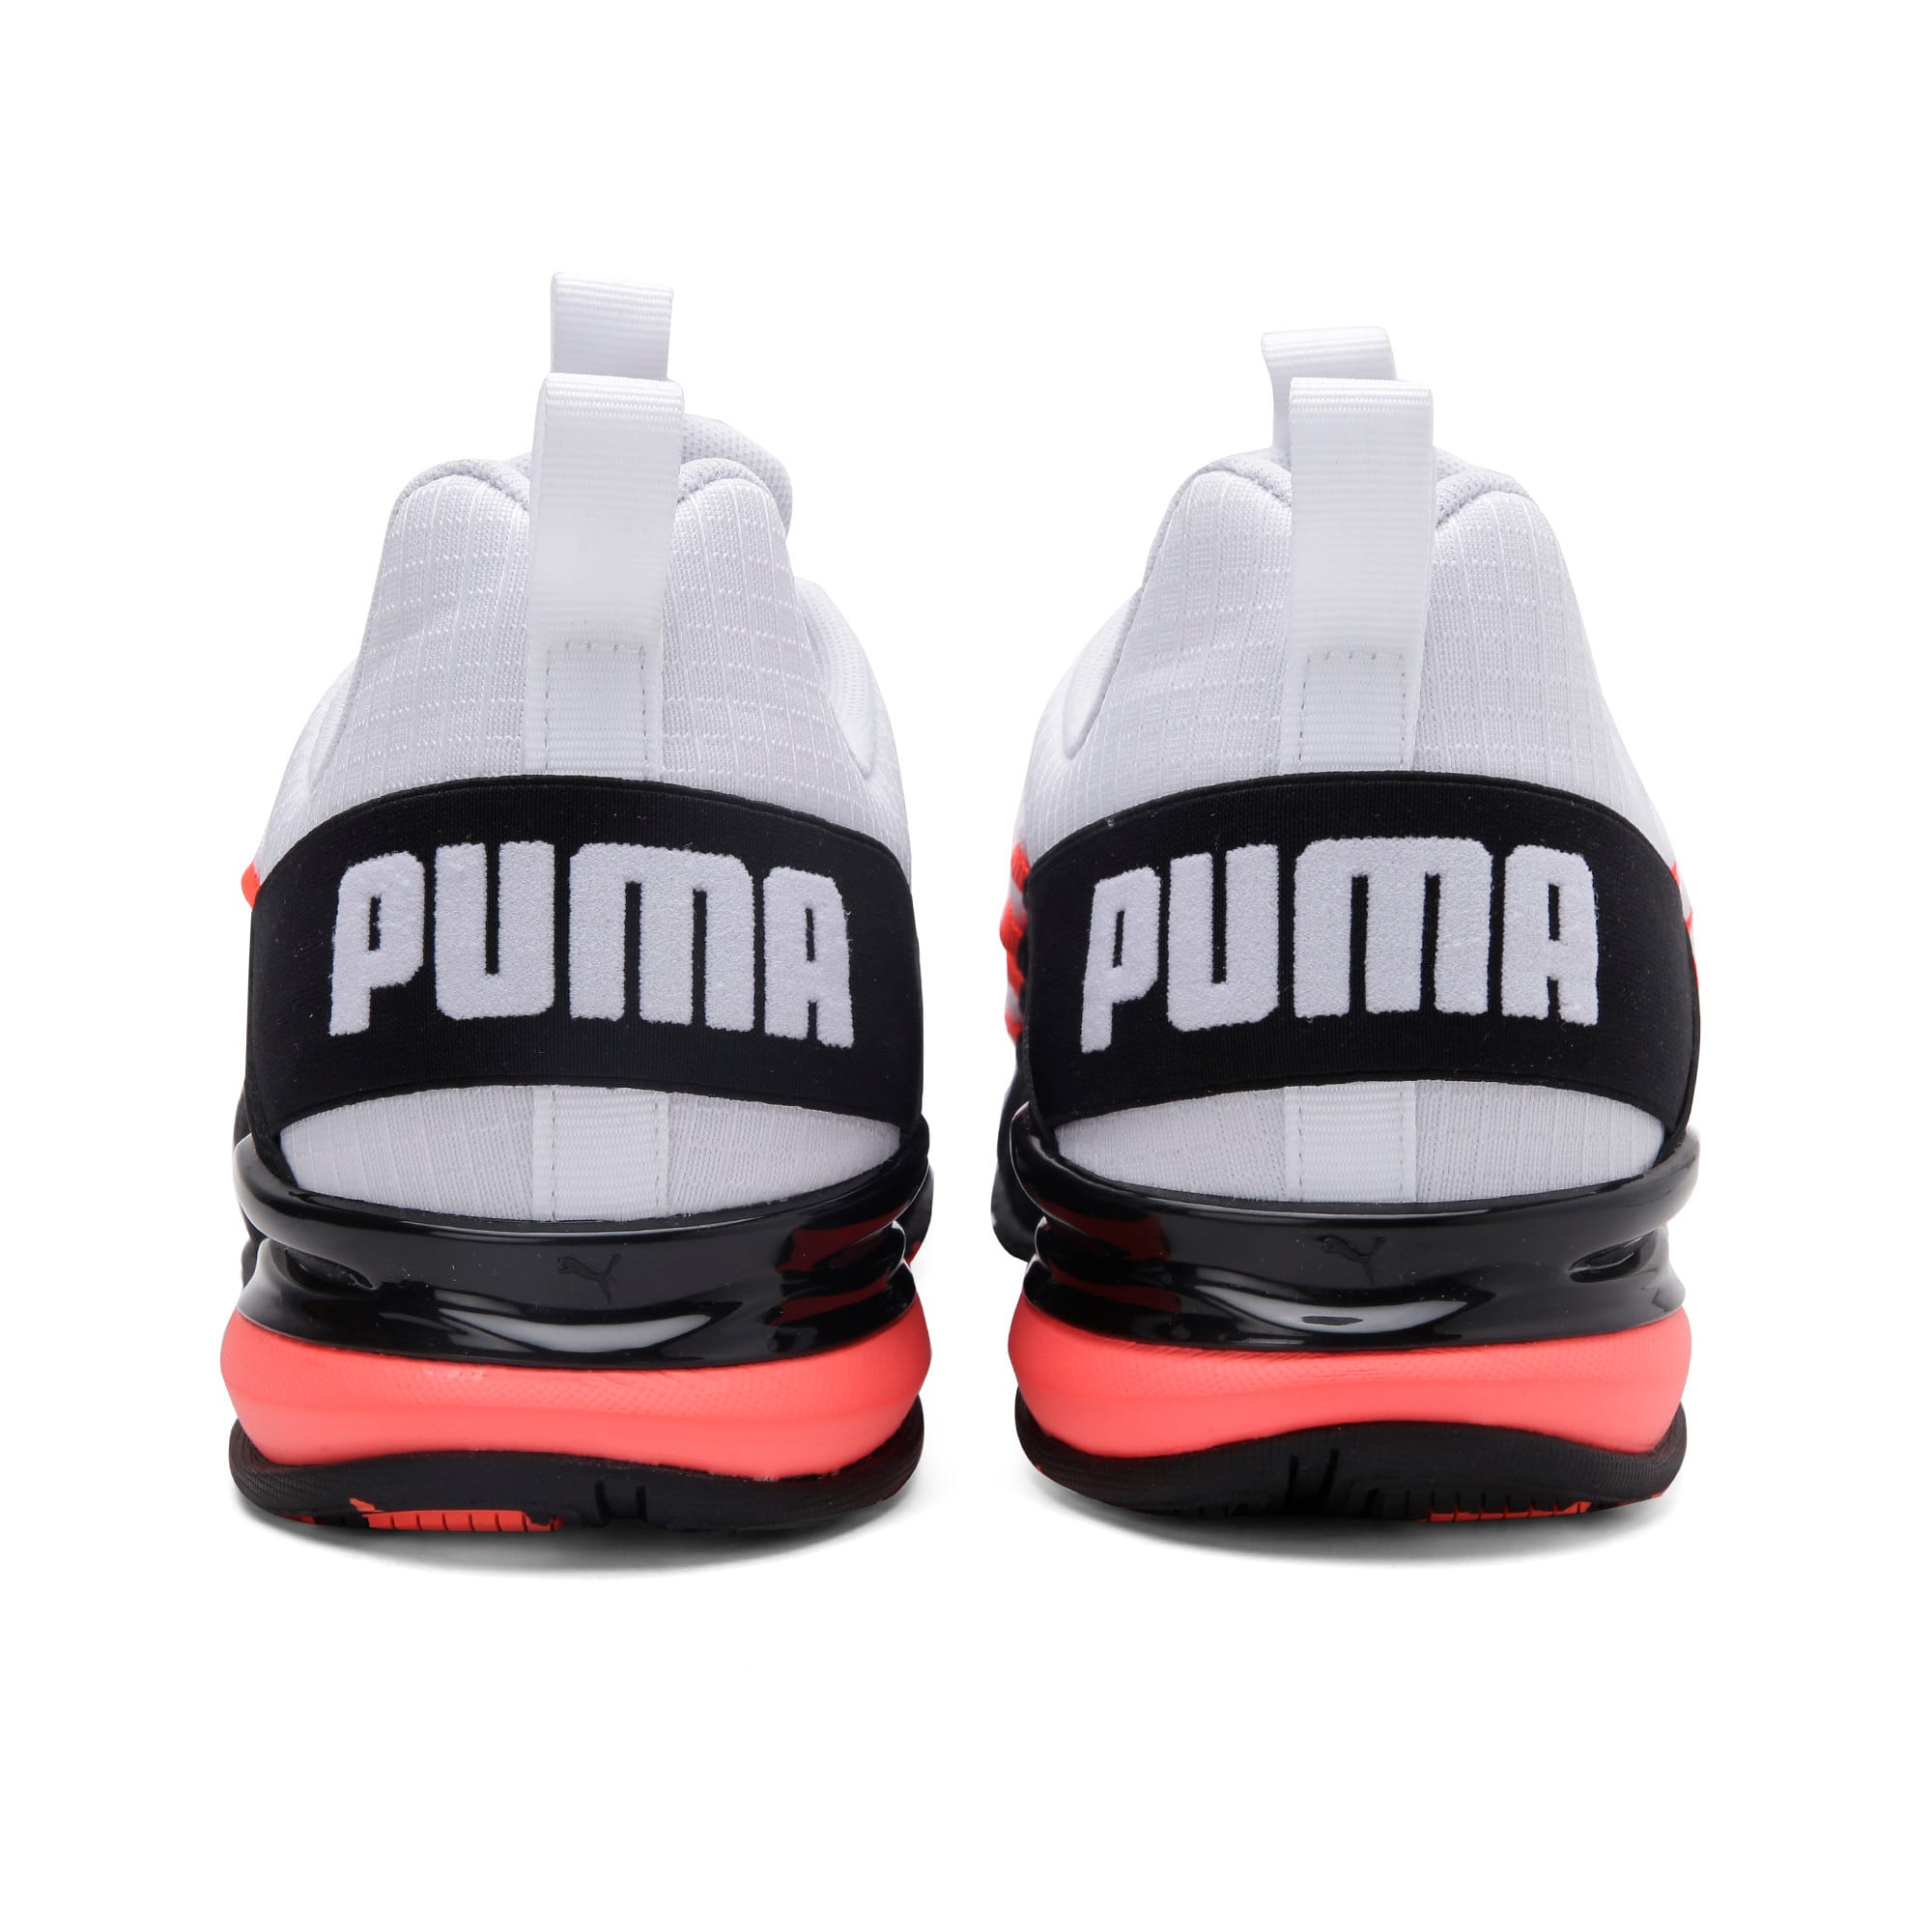 Thumbnail 4 of Axelion Rip Men's Training Shoes, White-Black-Nrgy Red, medium